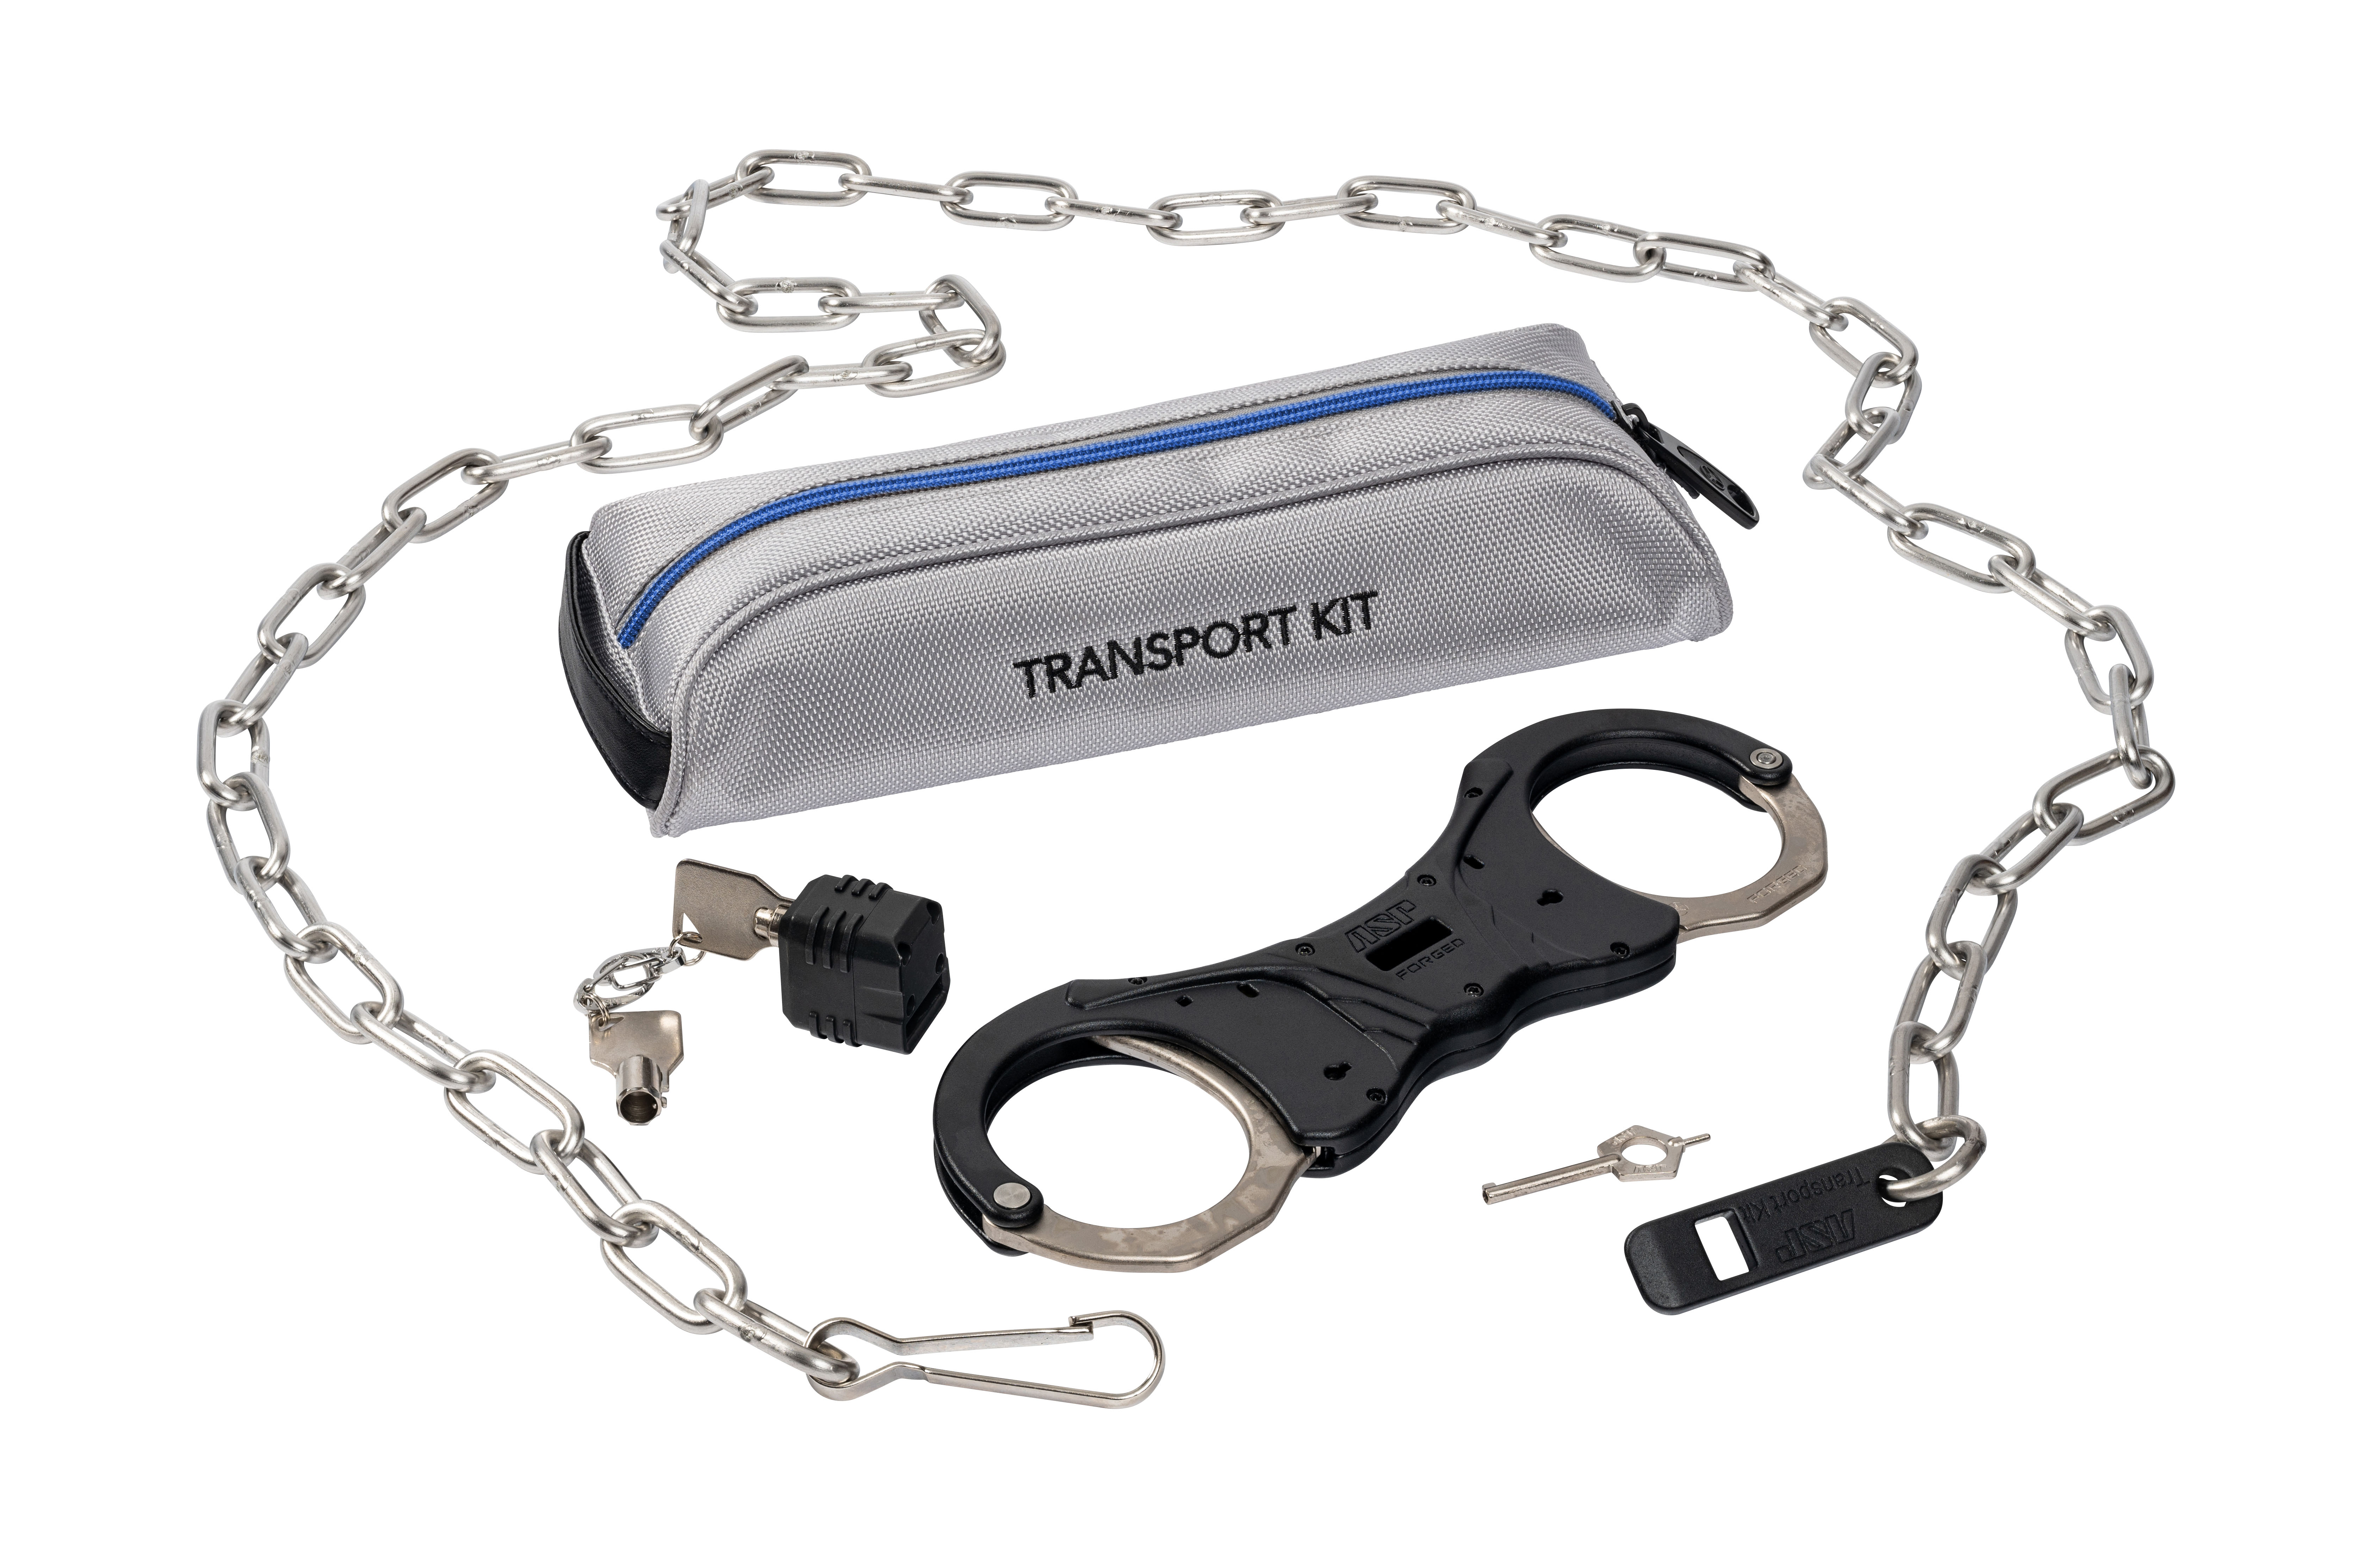 ASP Transport Kit - Chain (1 Pawl) / 56176